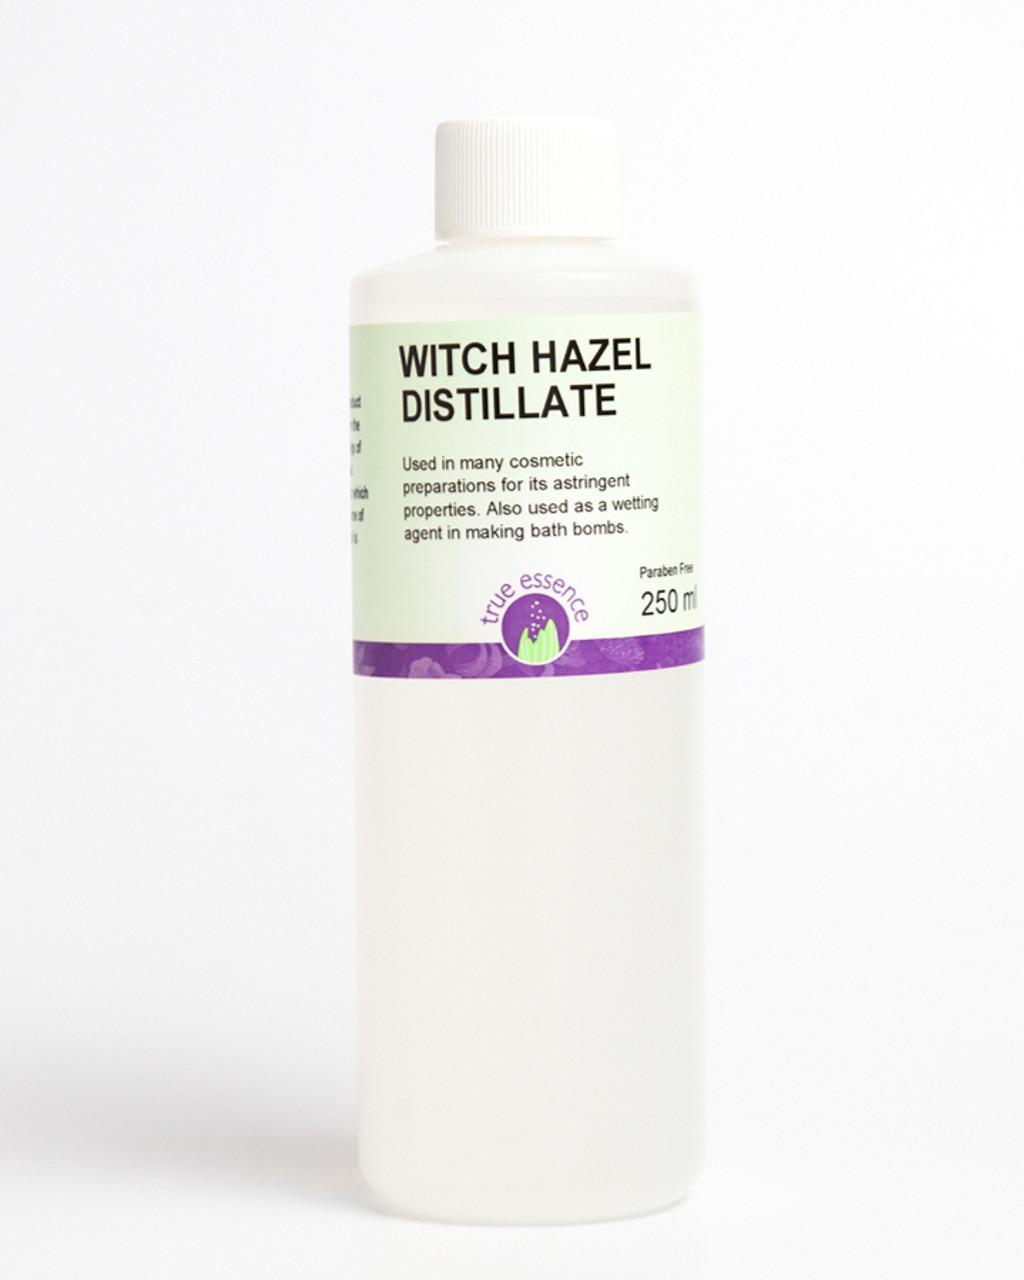 WITCH HAZEL (Hamamelis virginiana) DISTILLATE